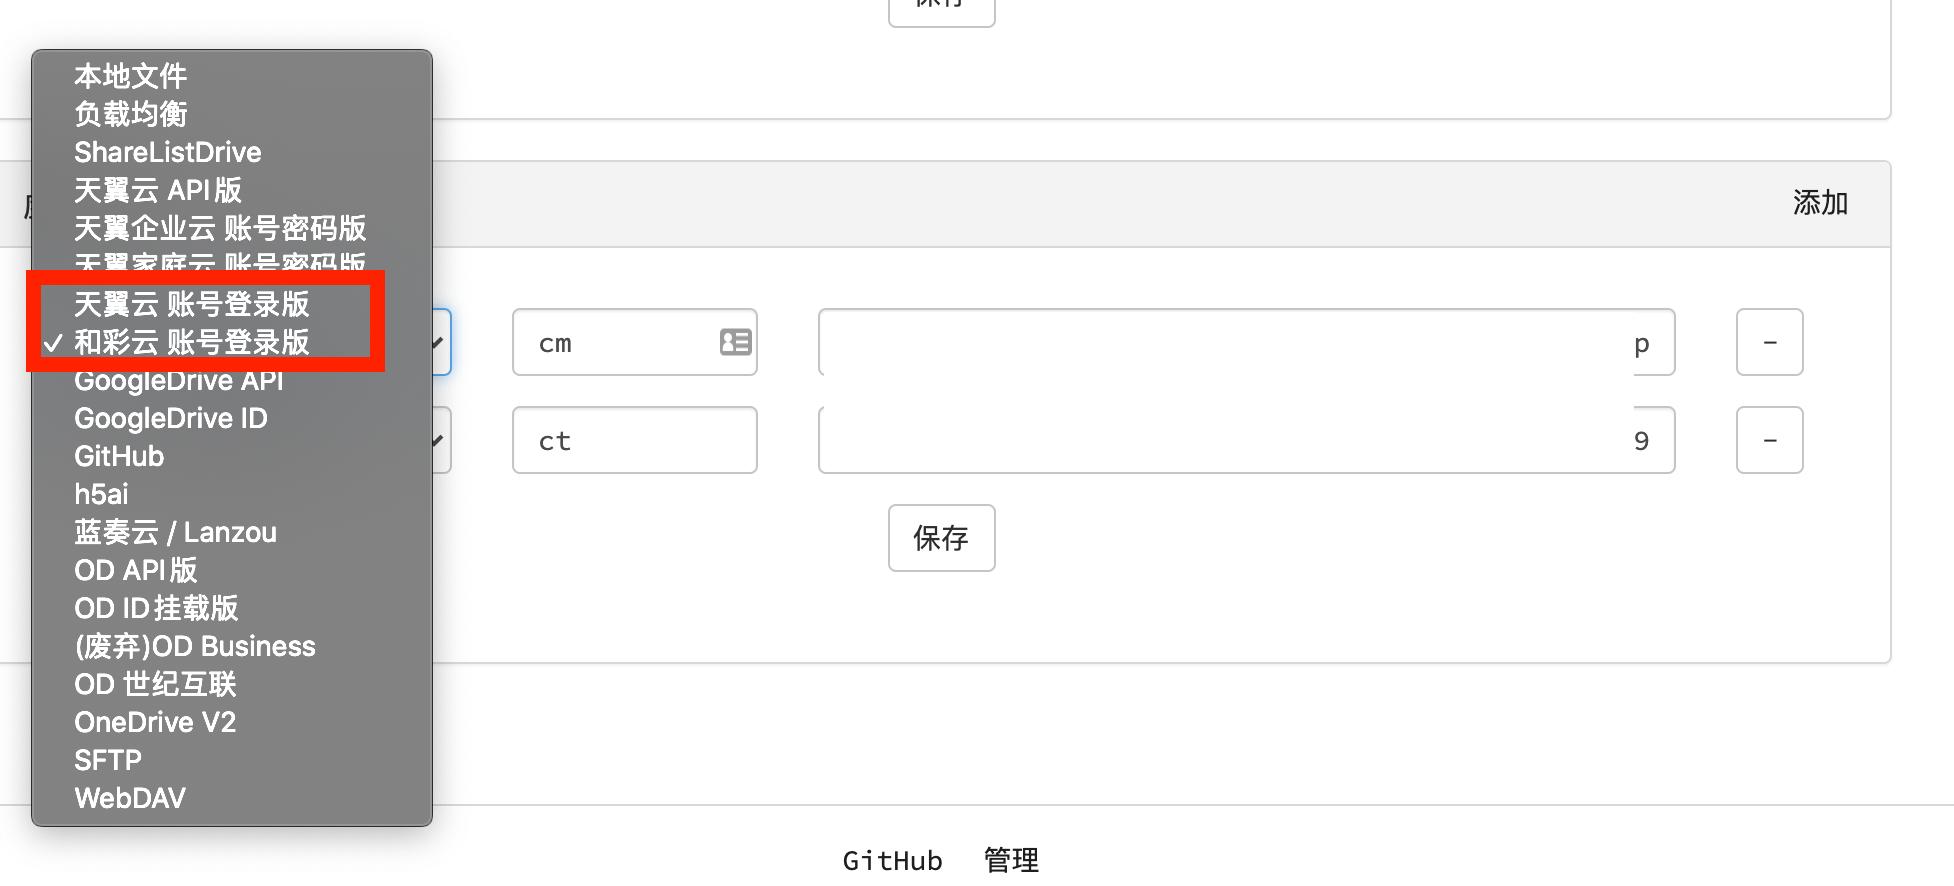 《ShareList网盘工具快速挂载和彩云、天翼云盘获取直链折腾笔记》